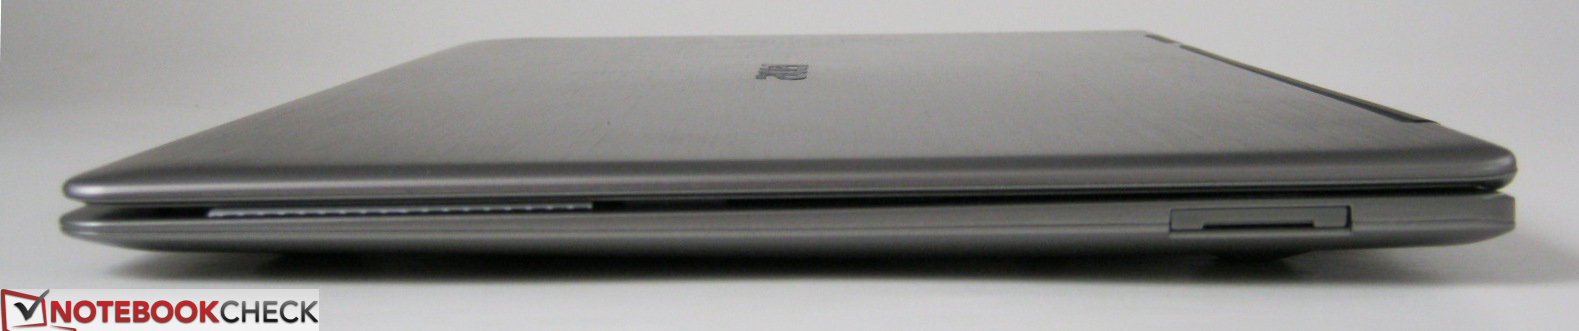 USB 2.0 External CD//DVD Drive for Acer Aspire S3-951-6697